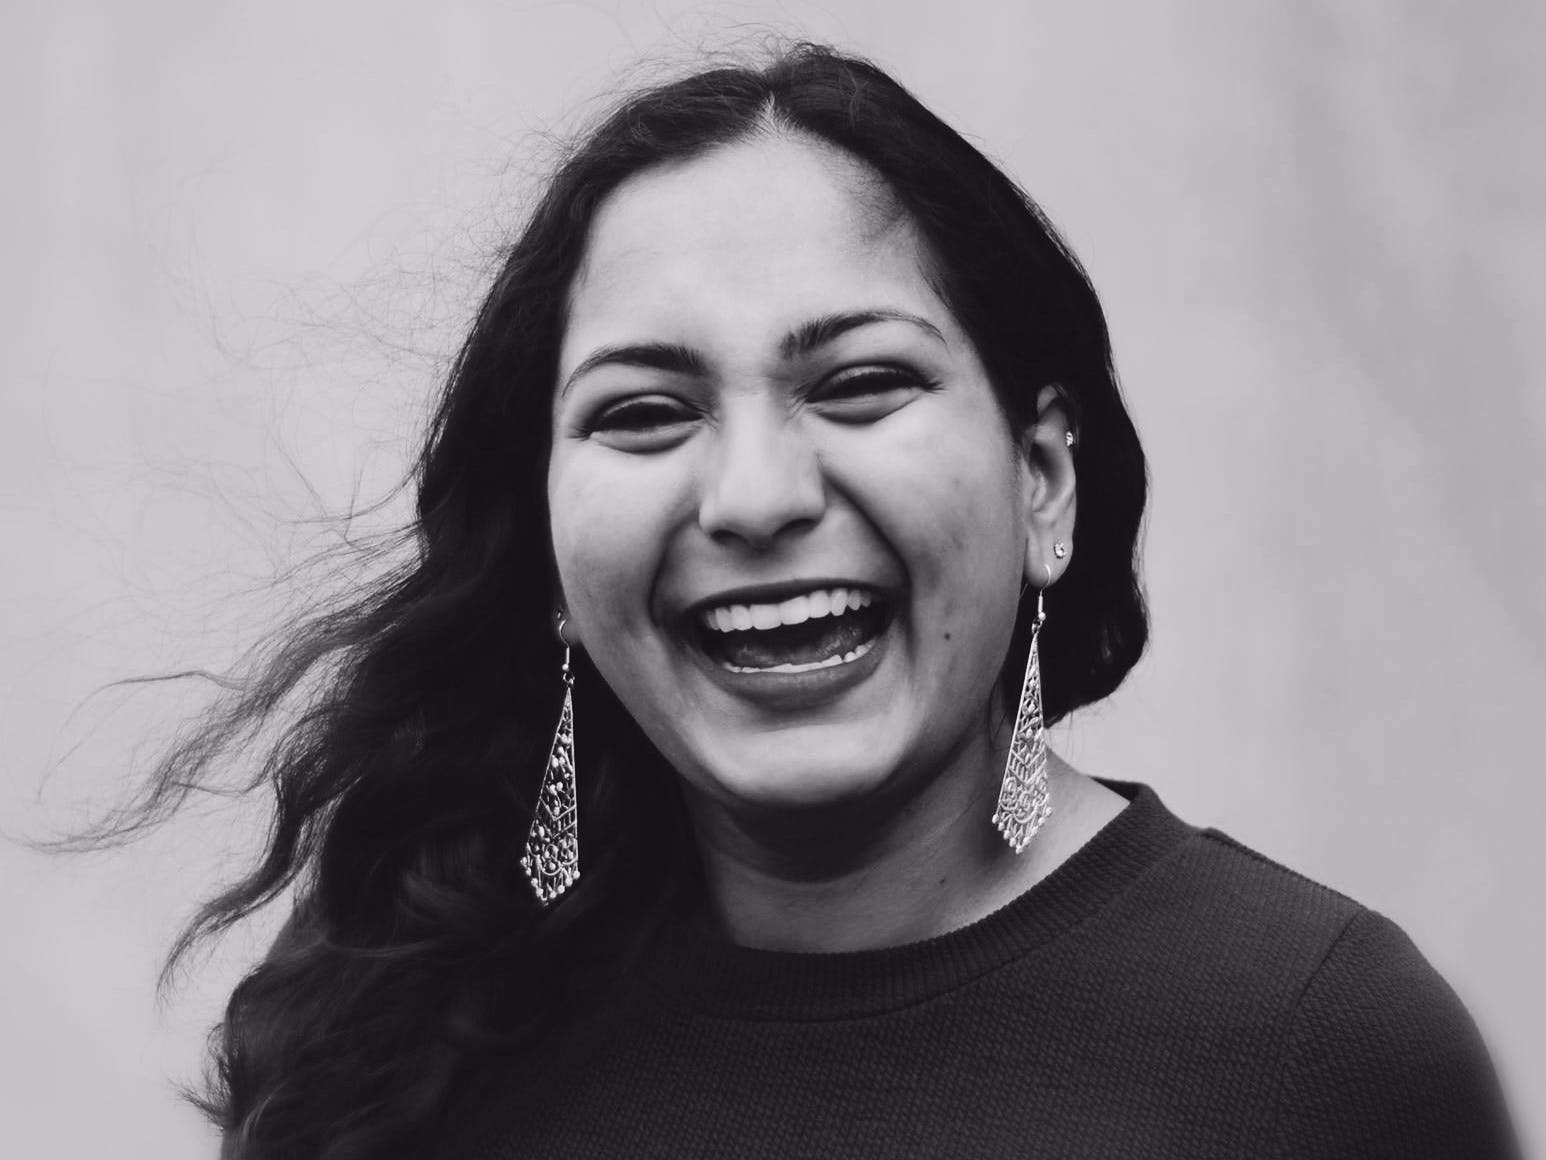 seema.com, seema newsletter, SEEMA SUMMIT, seema network, Nayantara Dutta, Nayantara Dutta's unapologetically Muslim, defining desi, founder of defining desi, The Drum, Campaign US Female Frontier Award, how to market to muslims, South Asian Indian entrepreneurs, South Asian Entrepreneur women,